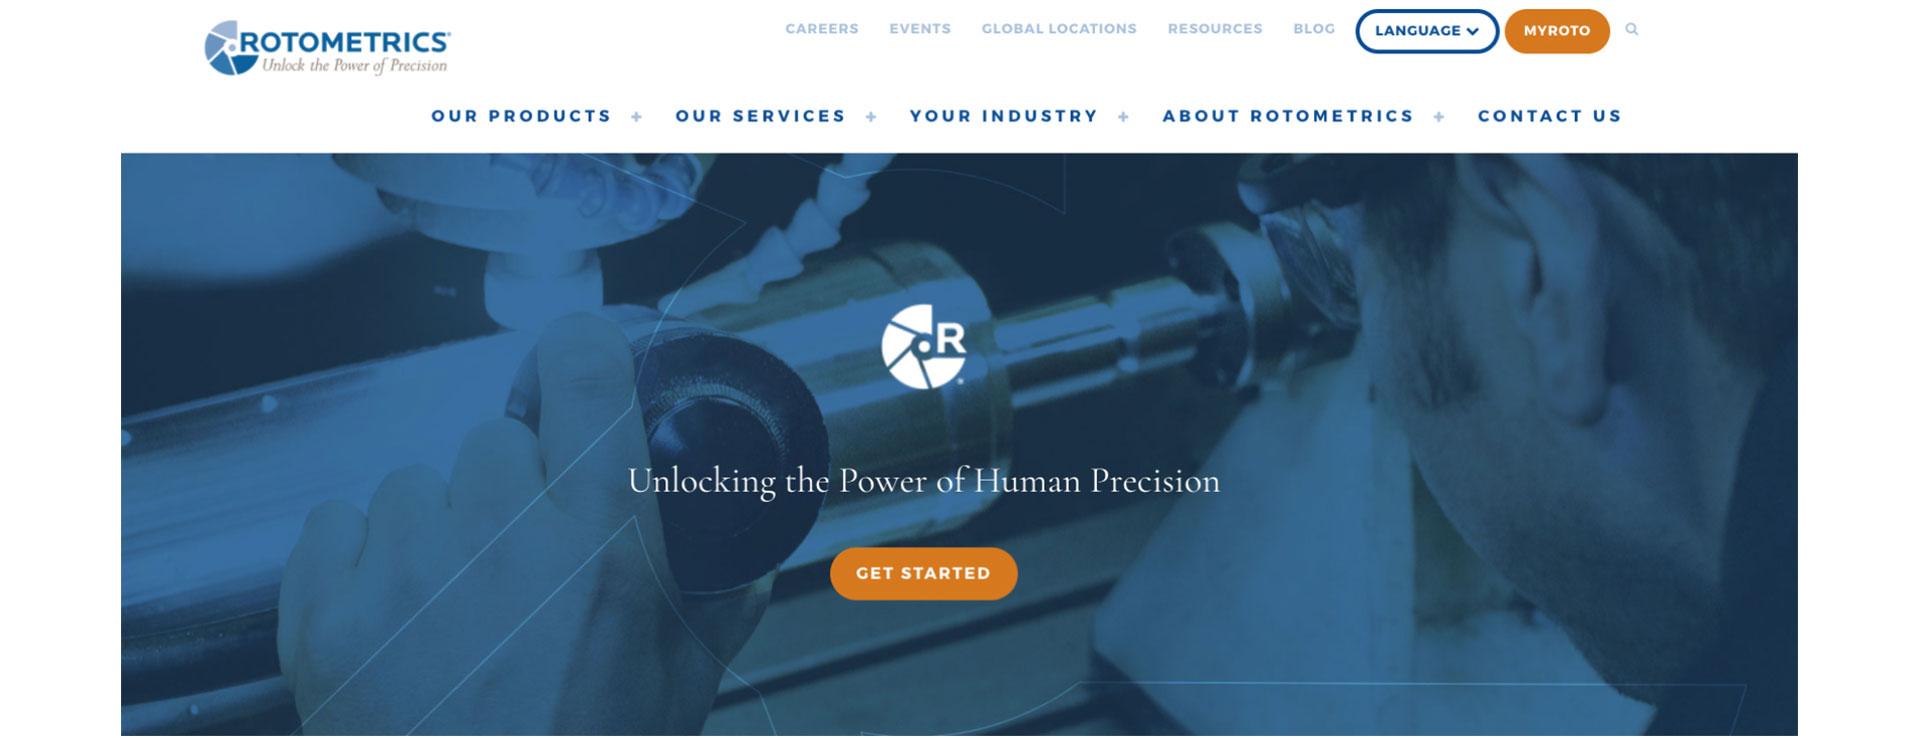 RotoMetric's homepage hero image